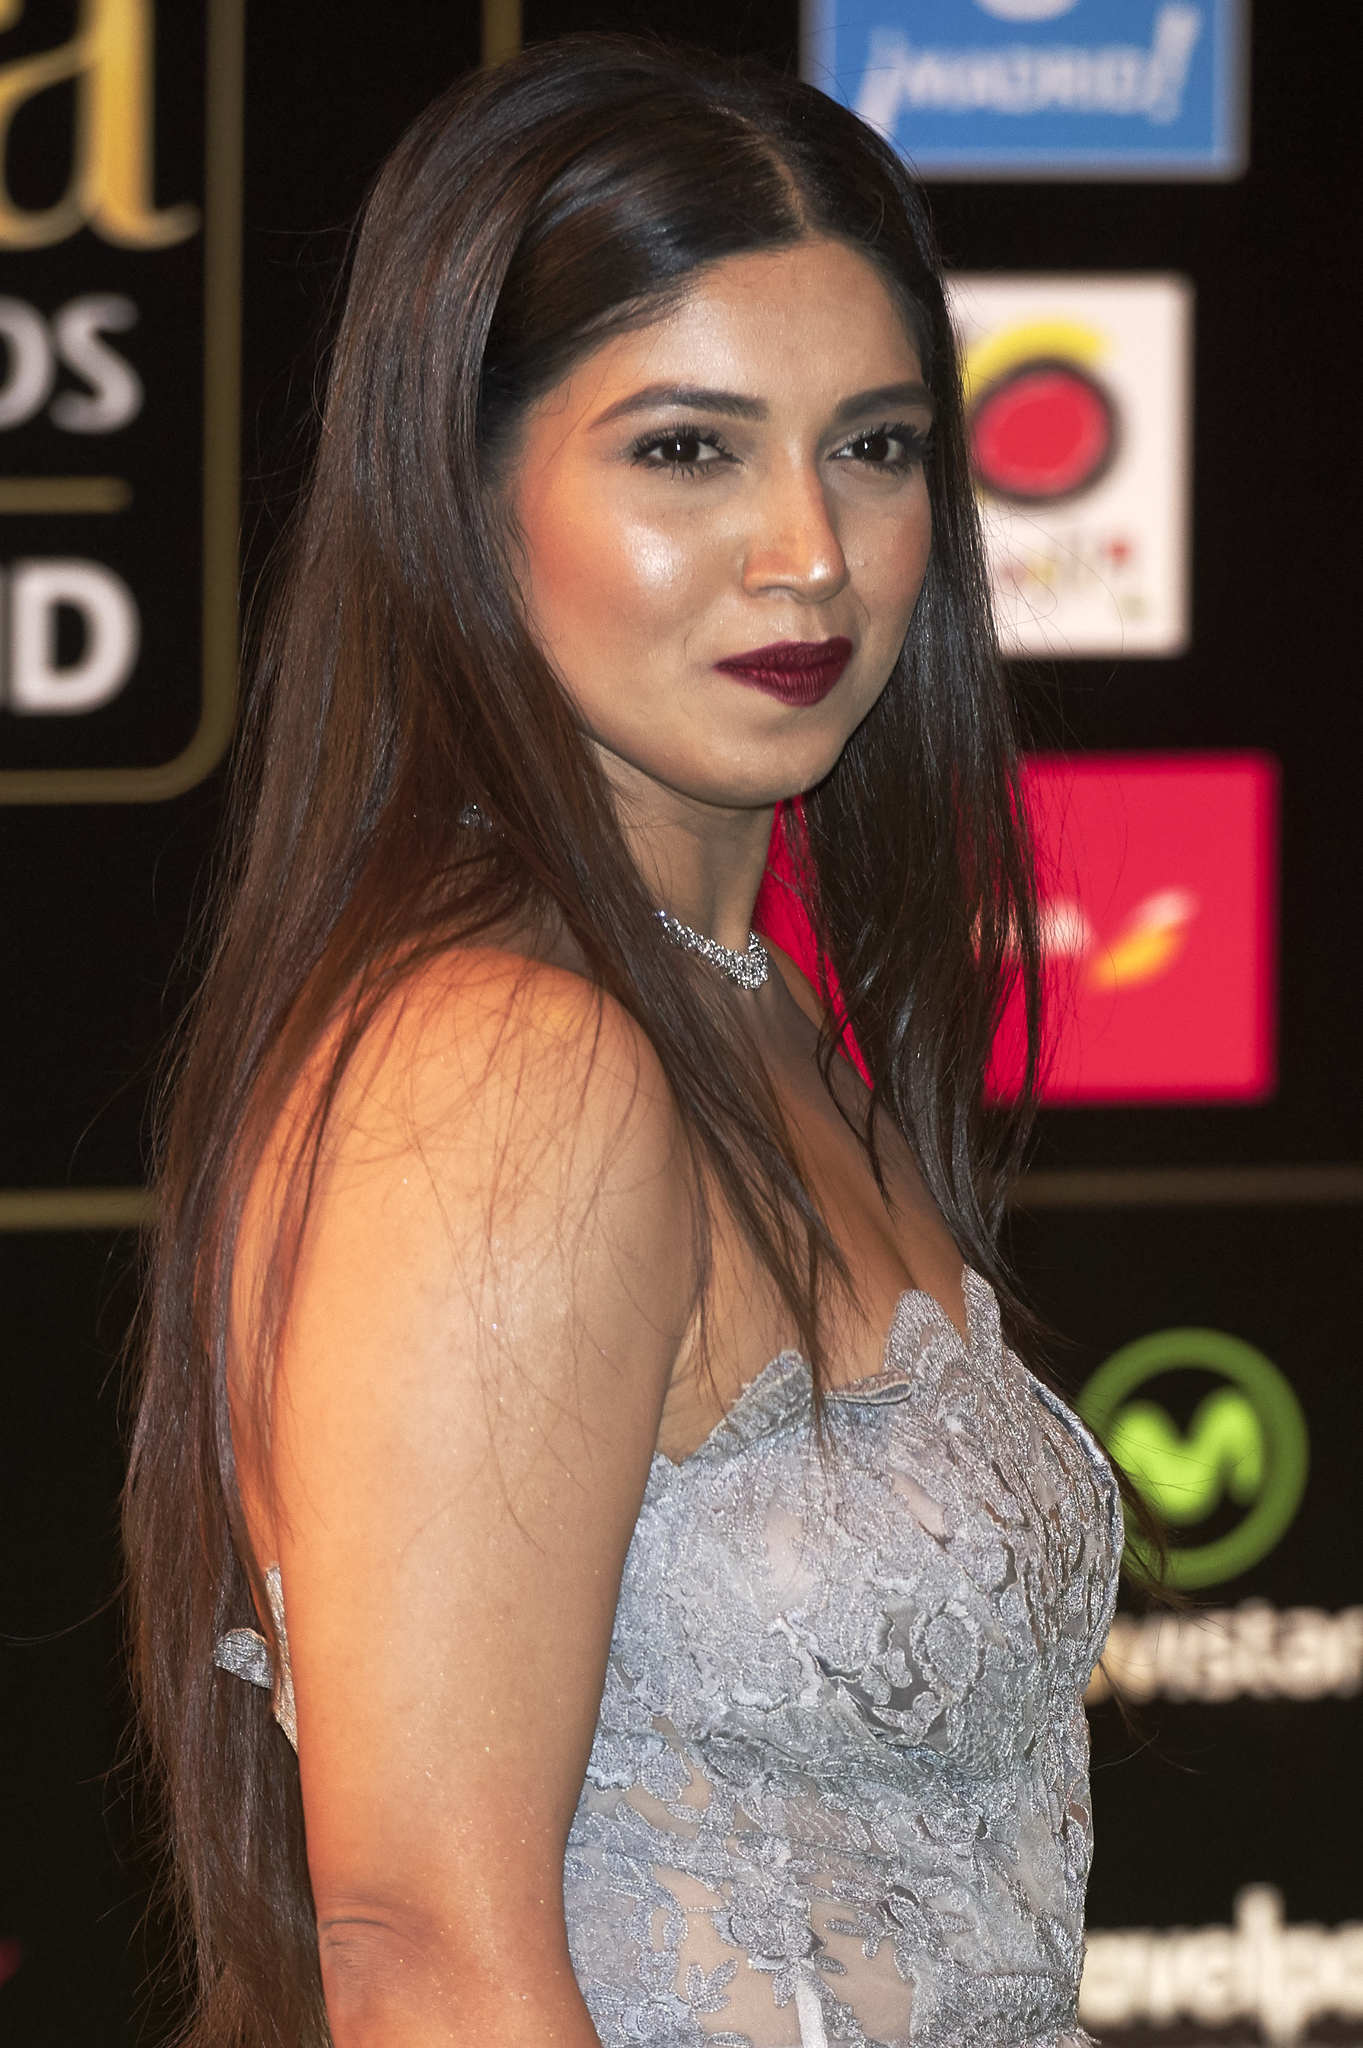 Bhumi Pednekar Biografi Aktor Film Penghargaan Fakta